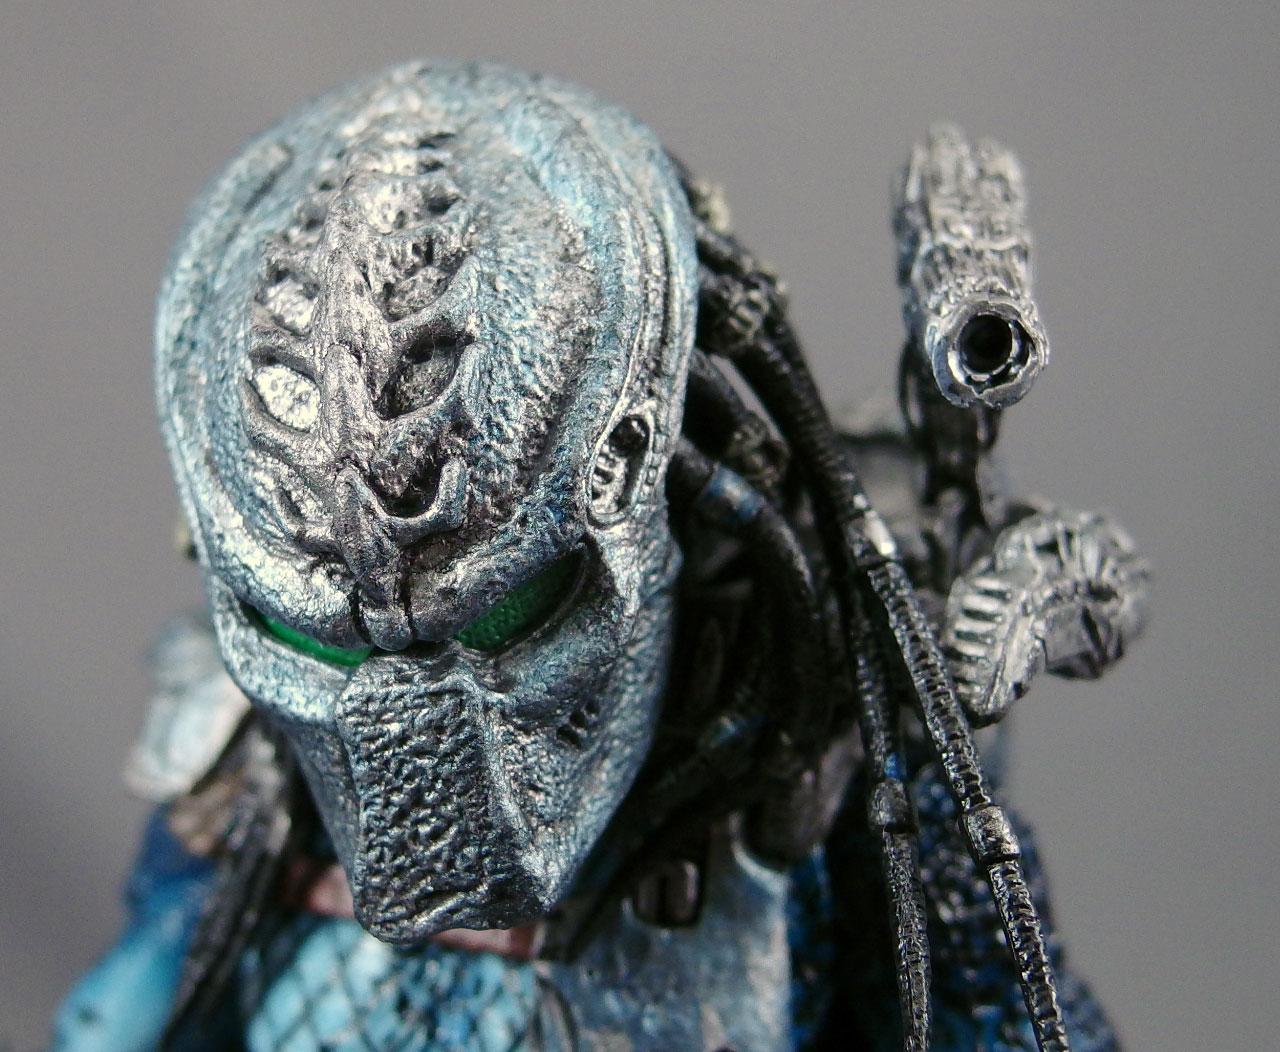 Hive Wars Predator Xenopedia Fandom Powered By Wikia